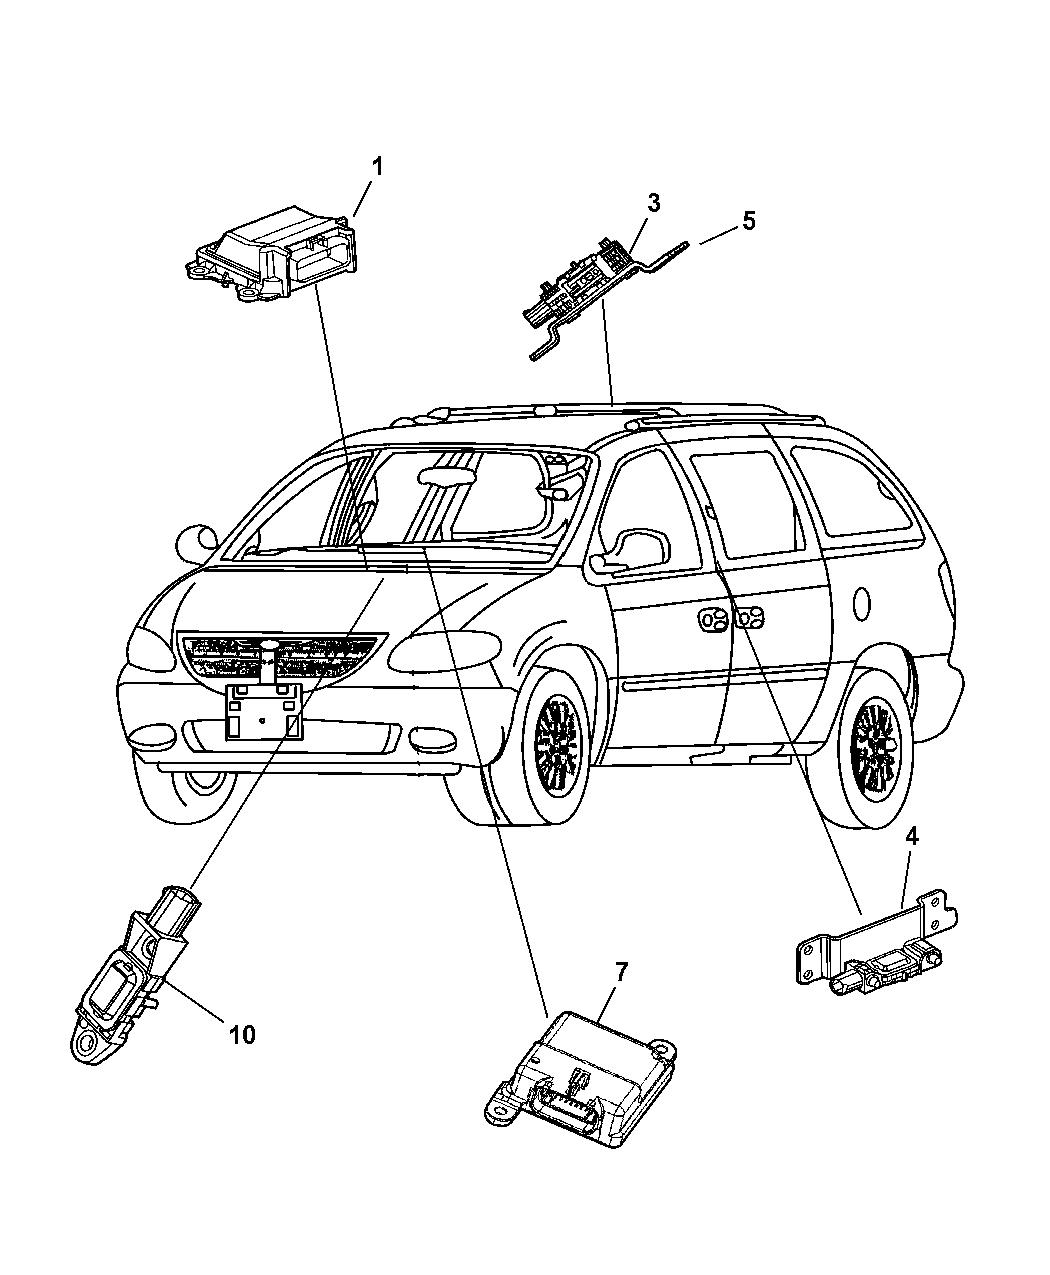 2006 Chrysler Town & Country Air Bag Modules & Sensors